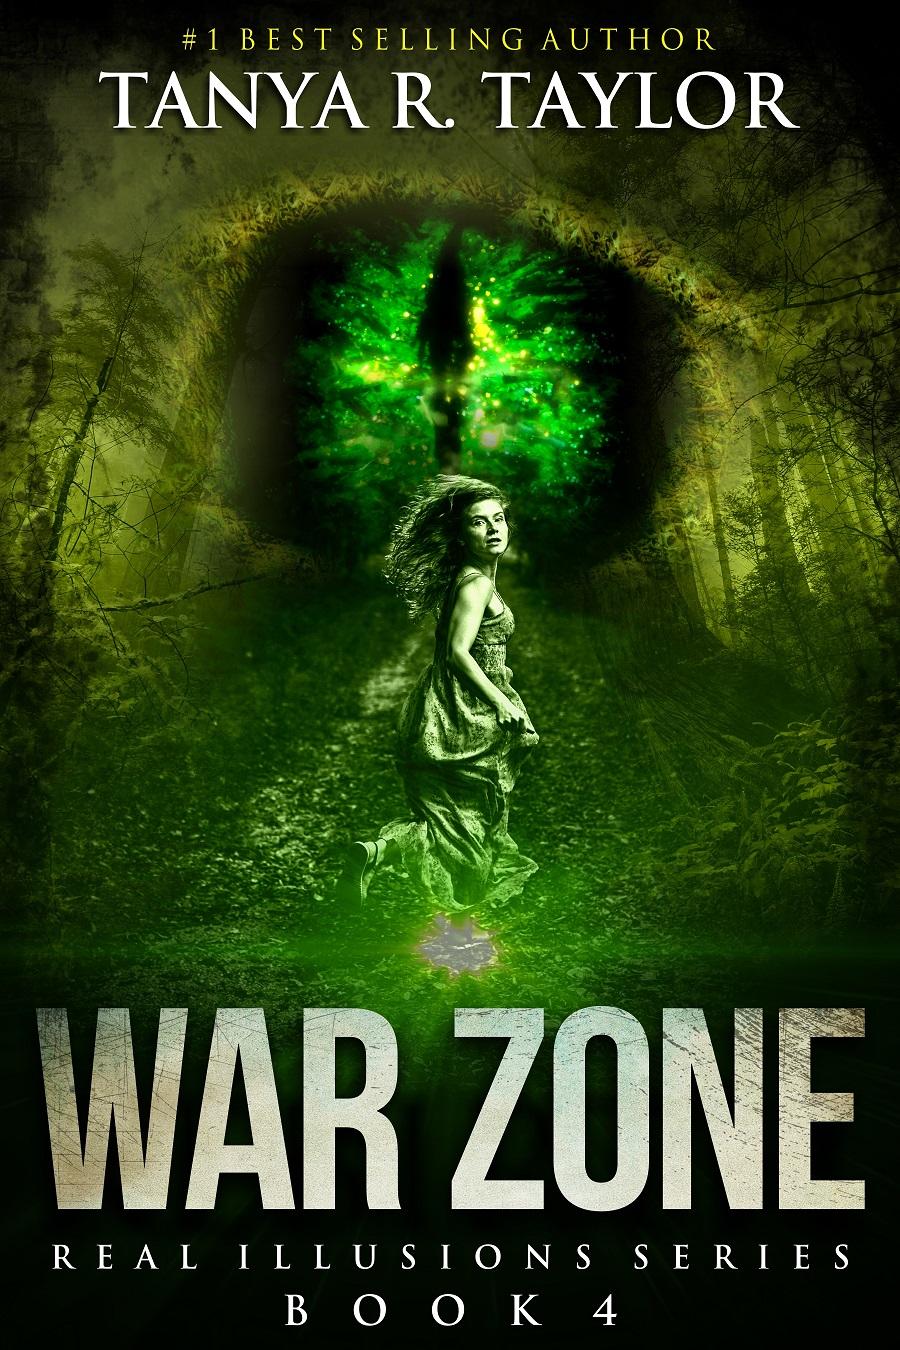 WAR ZONE REG